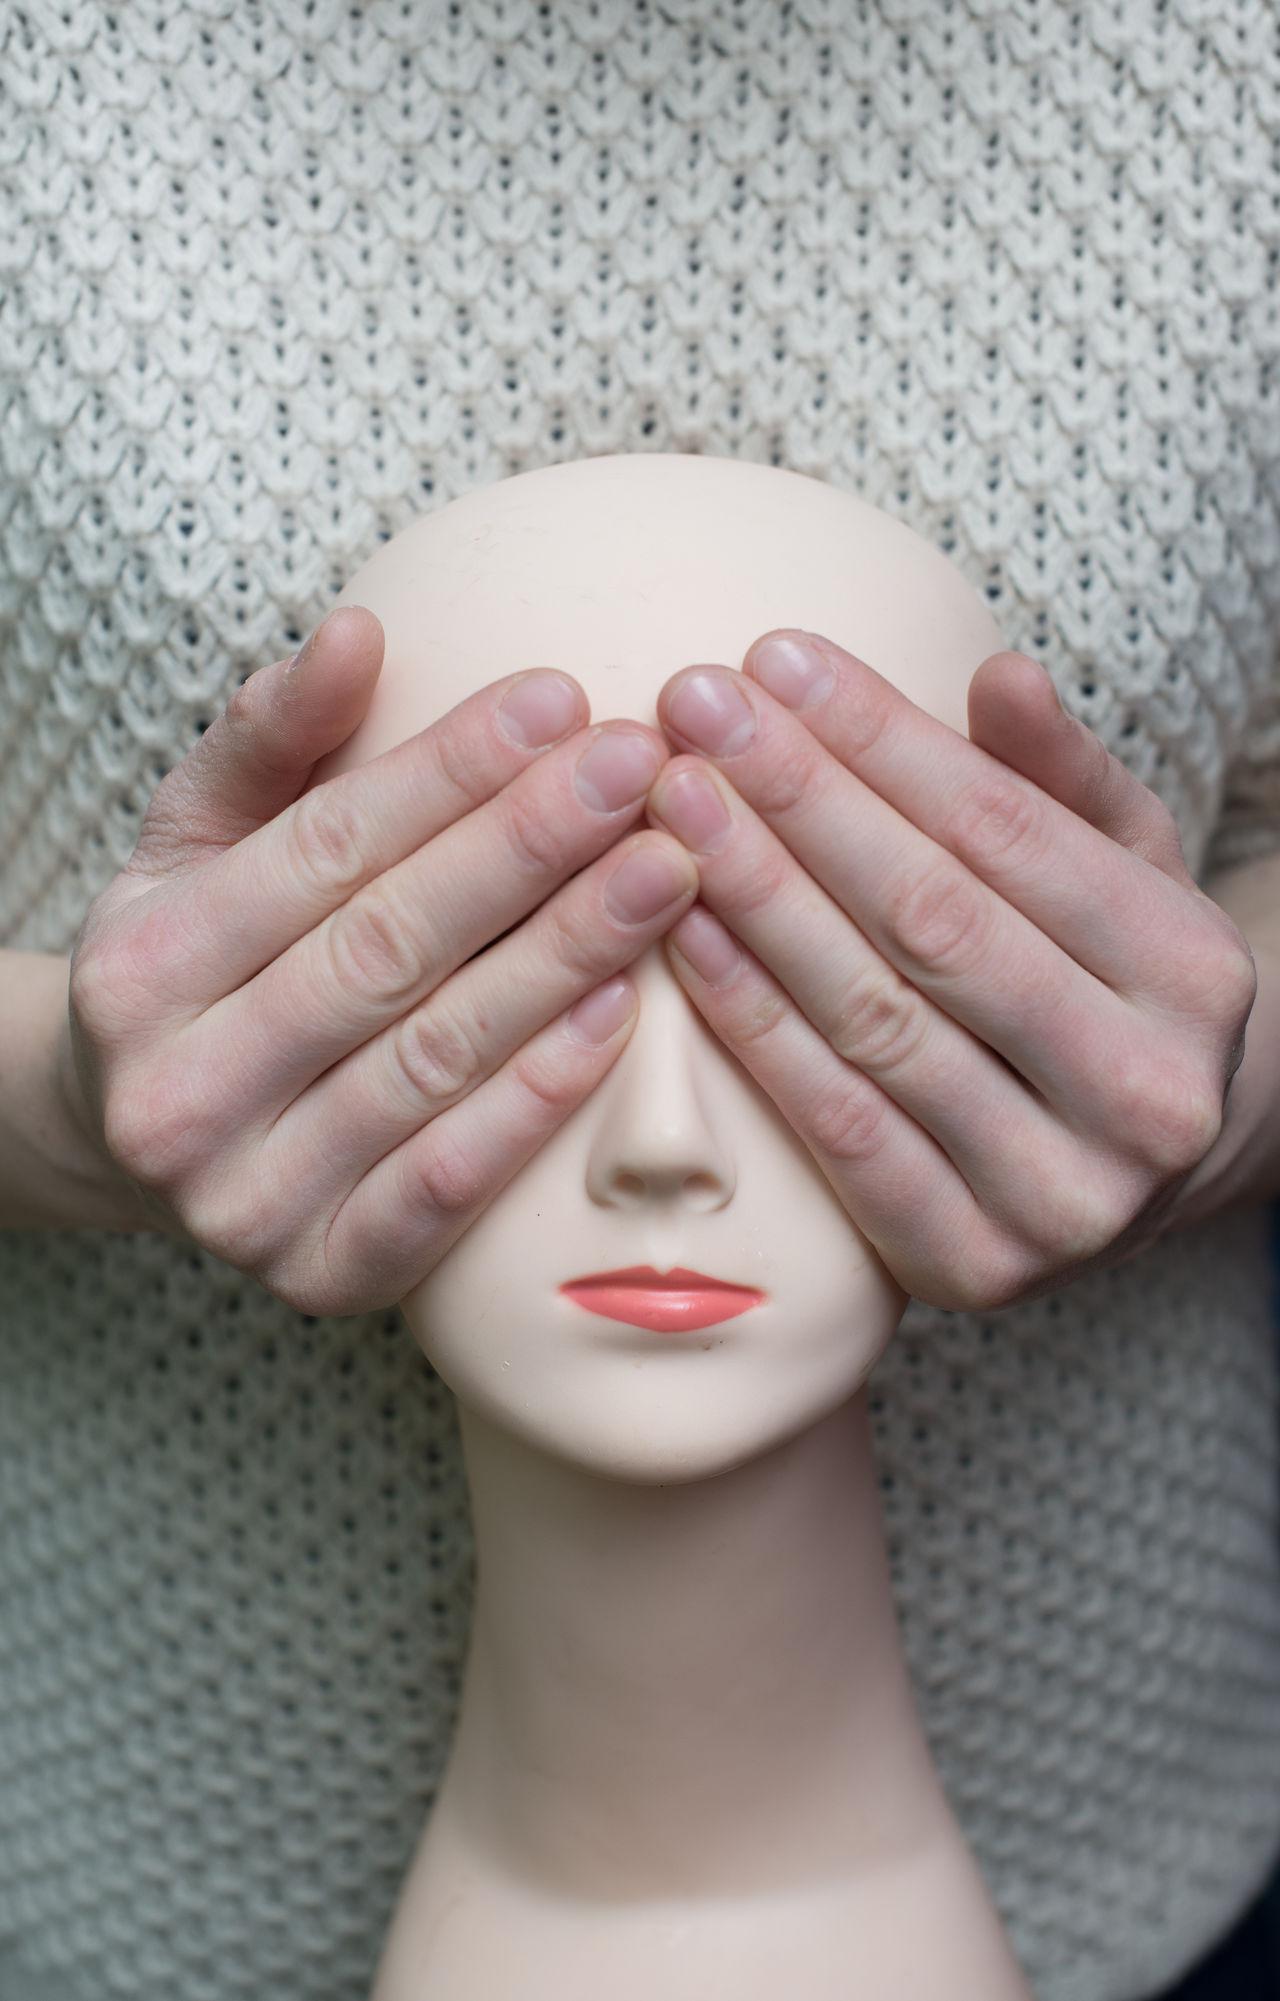 Art And Craft Close-up Day Human Body Part Human Hand Human Representation Indoors  Sculpture